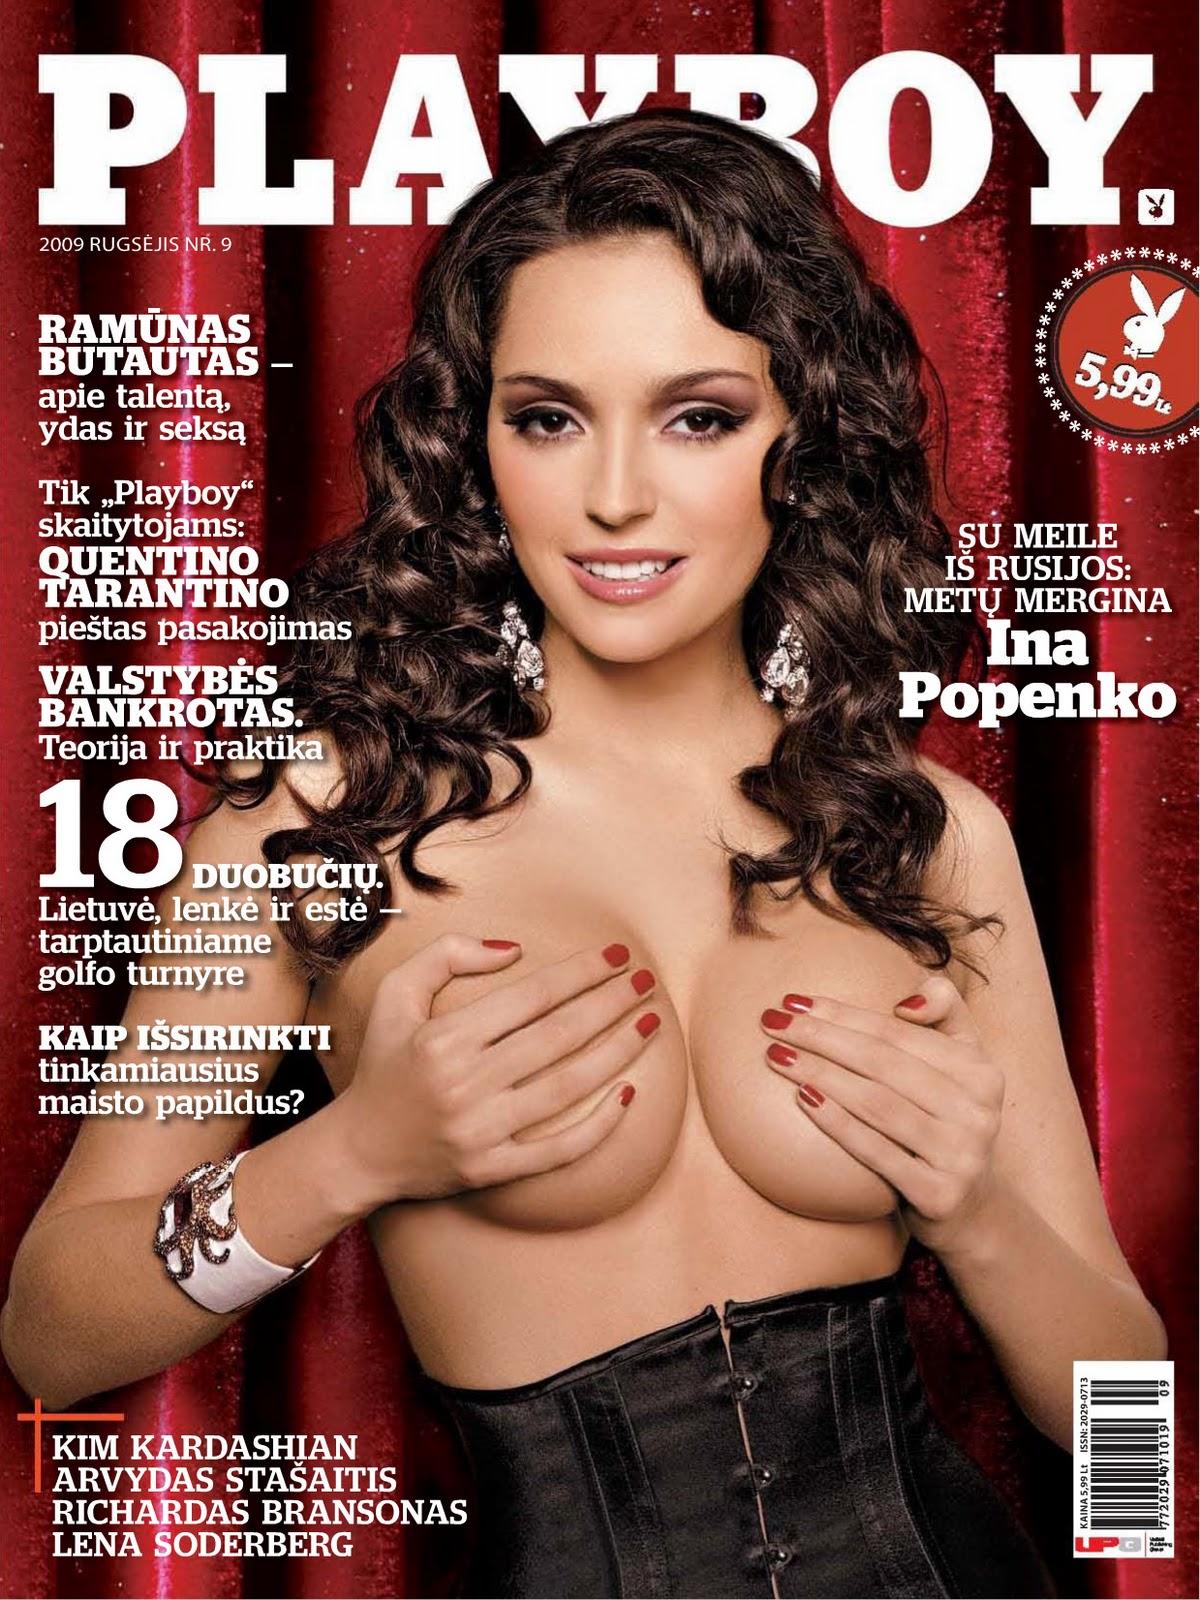 http://3.bp.blogspot.com/_Rq5hXlXNW7o/TKEoYN7FYNI/AAAAAAAAAhM/dYt73k5YY5s/s1600/37820_InnaPopenko_PlayboySeptember20099_2009Lithuania_01_123_554lo.jpg